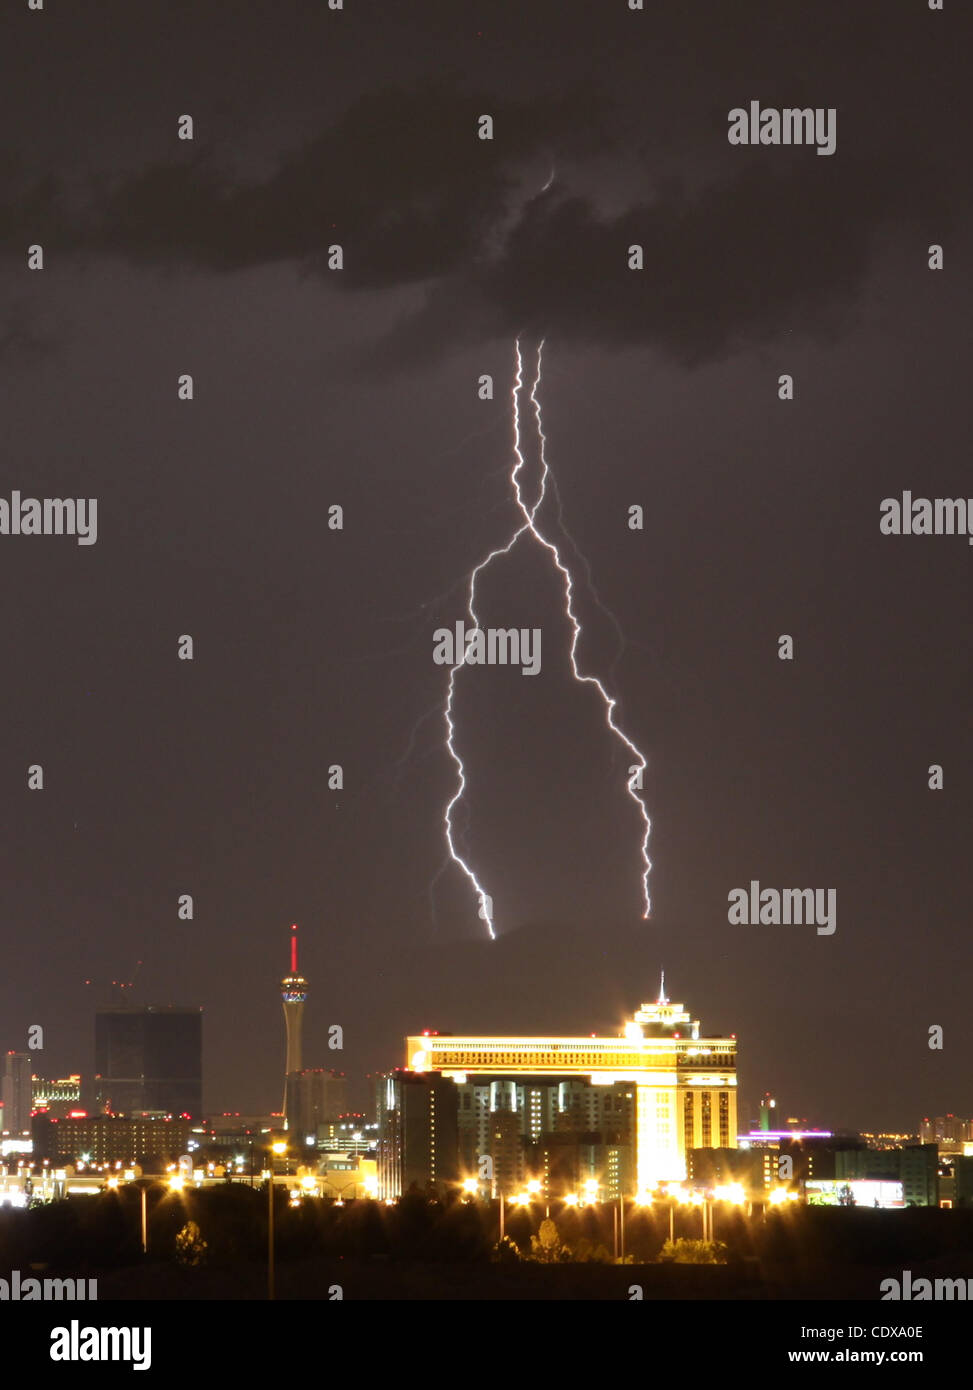 sept 13 2011 baker california usa monsoon storms light up the